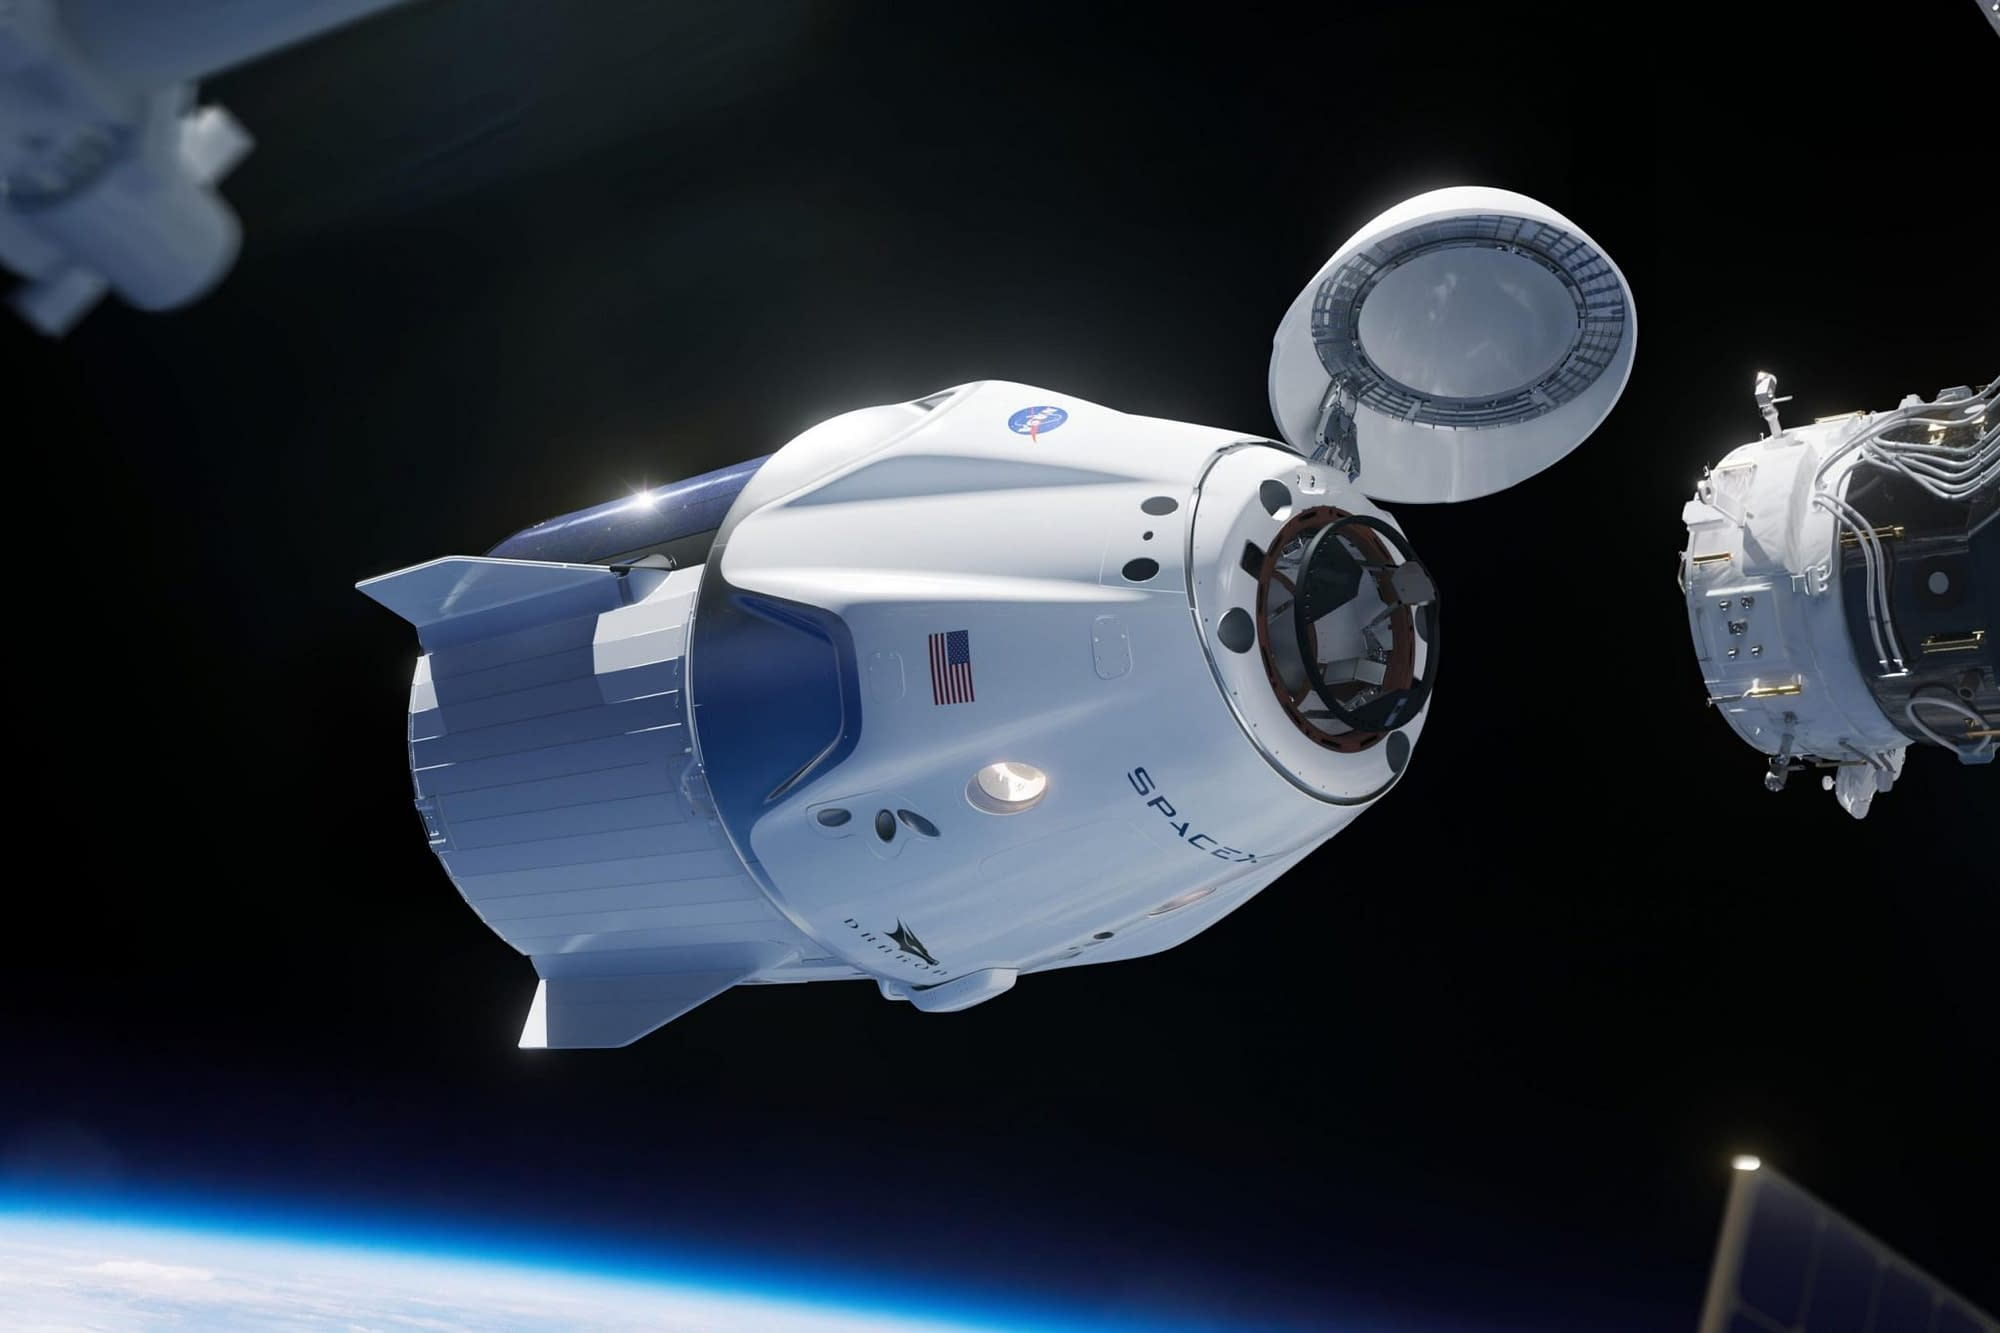 la crew dragon in orbita